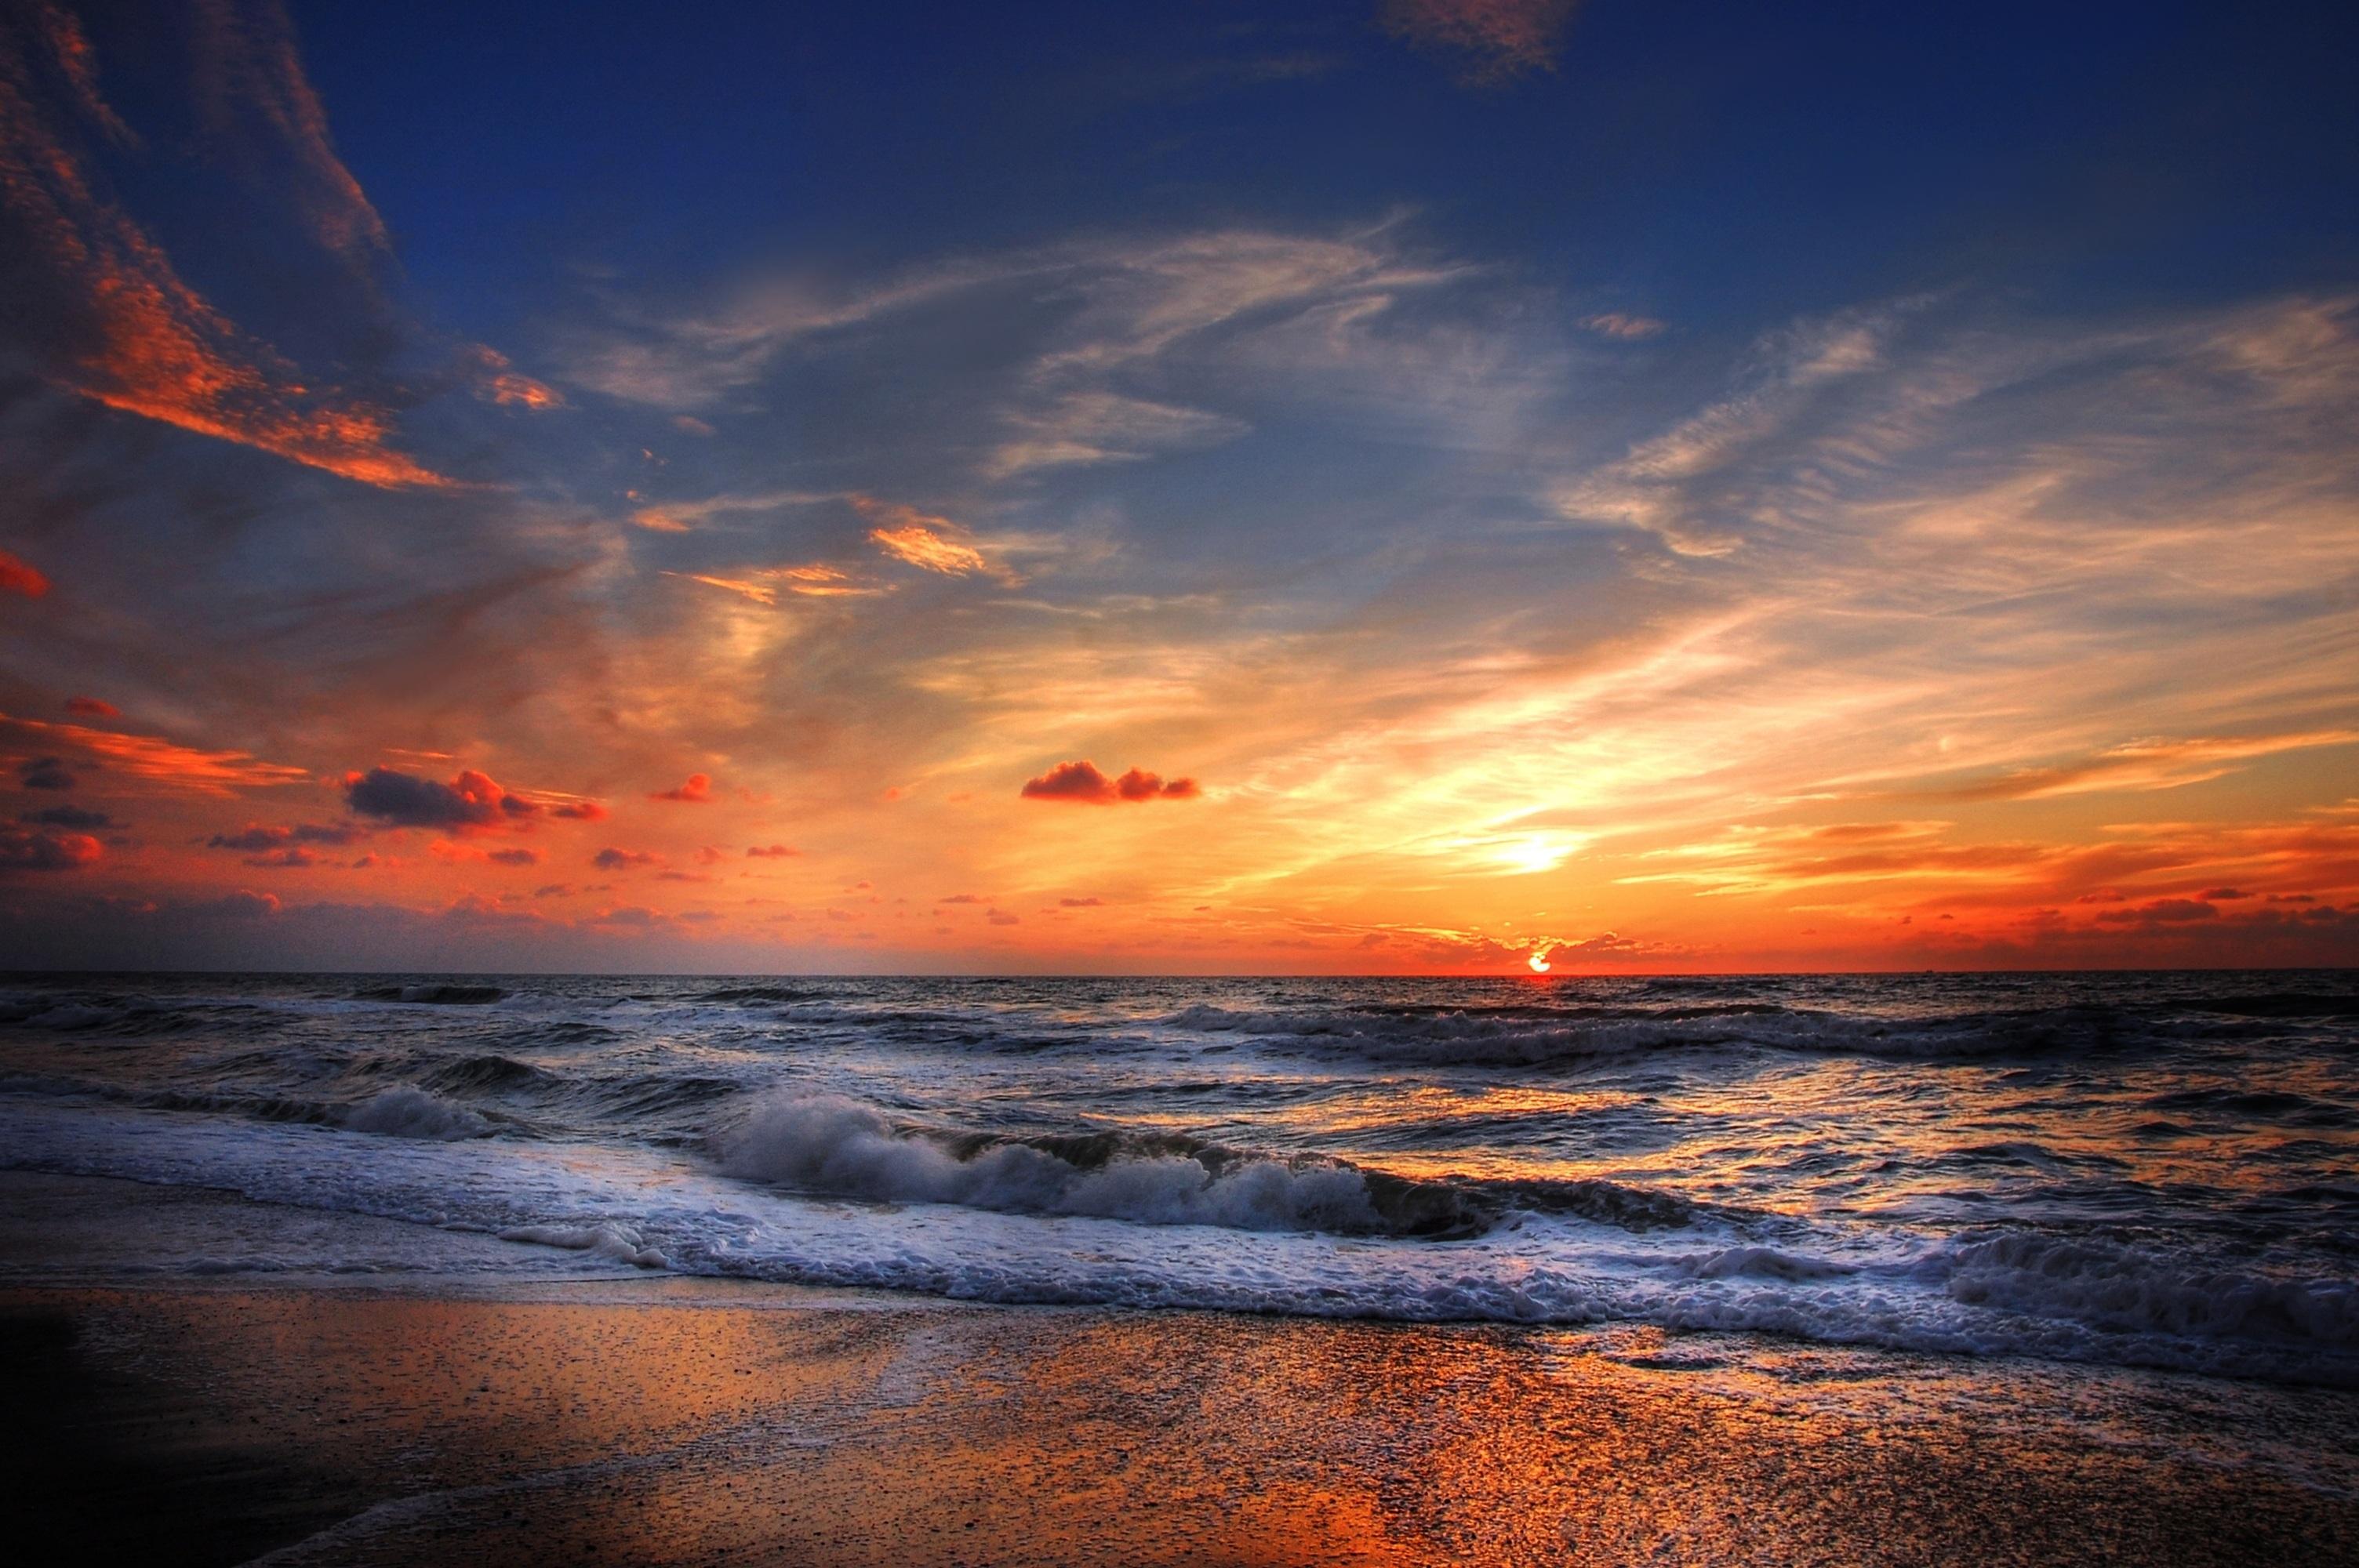 On the beach at sunset photo